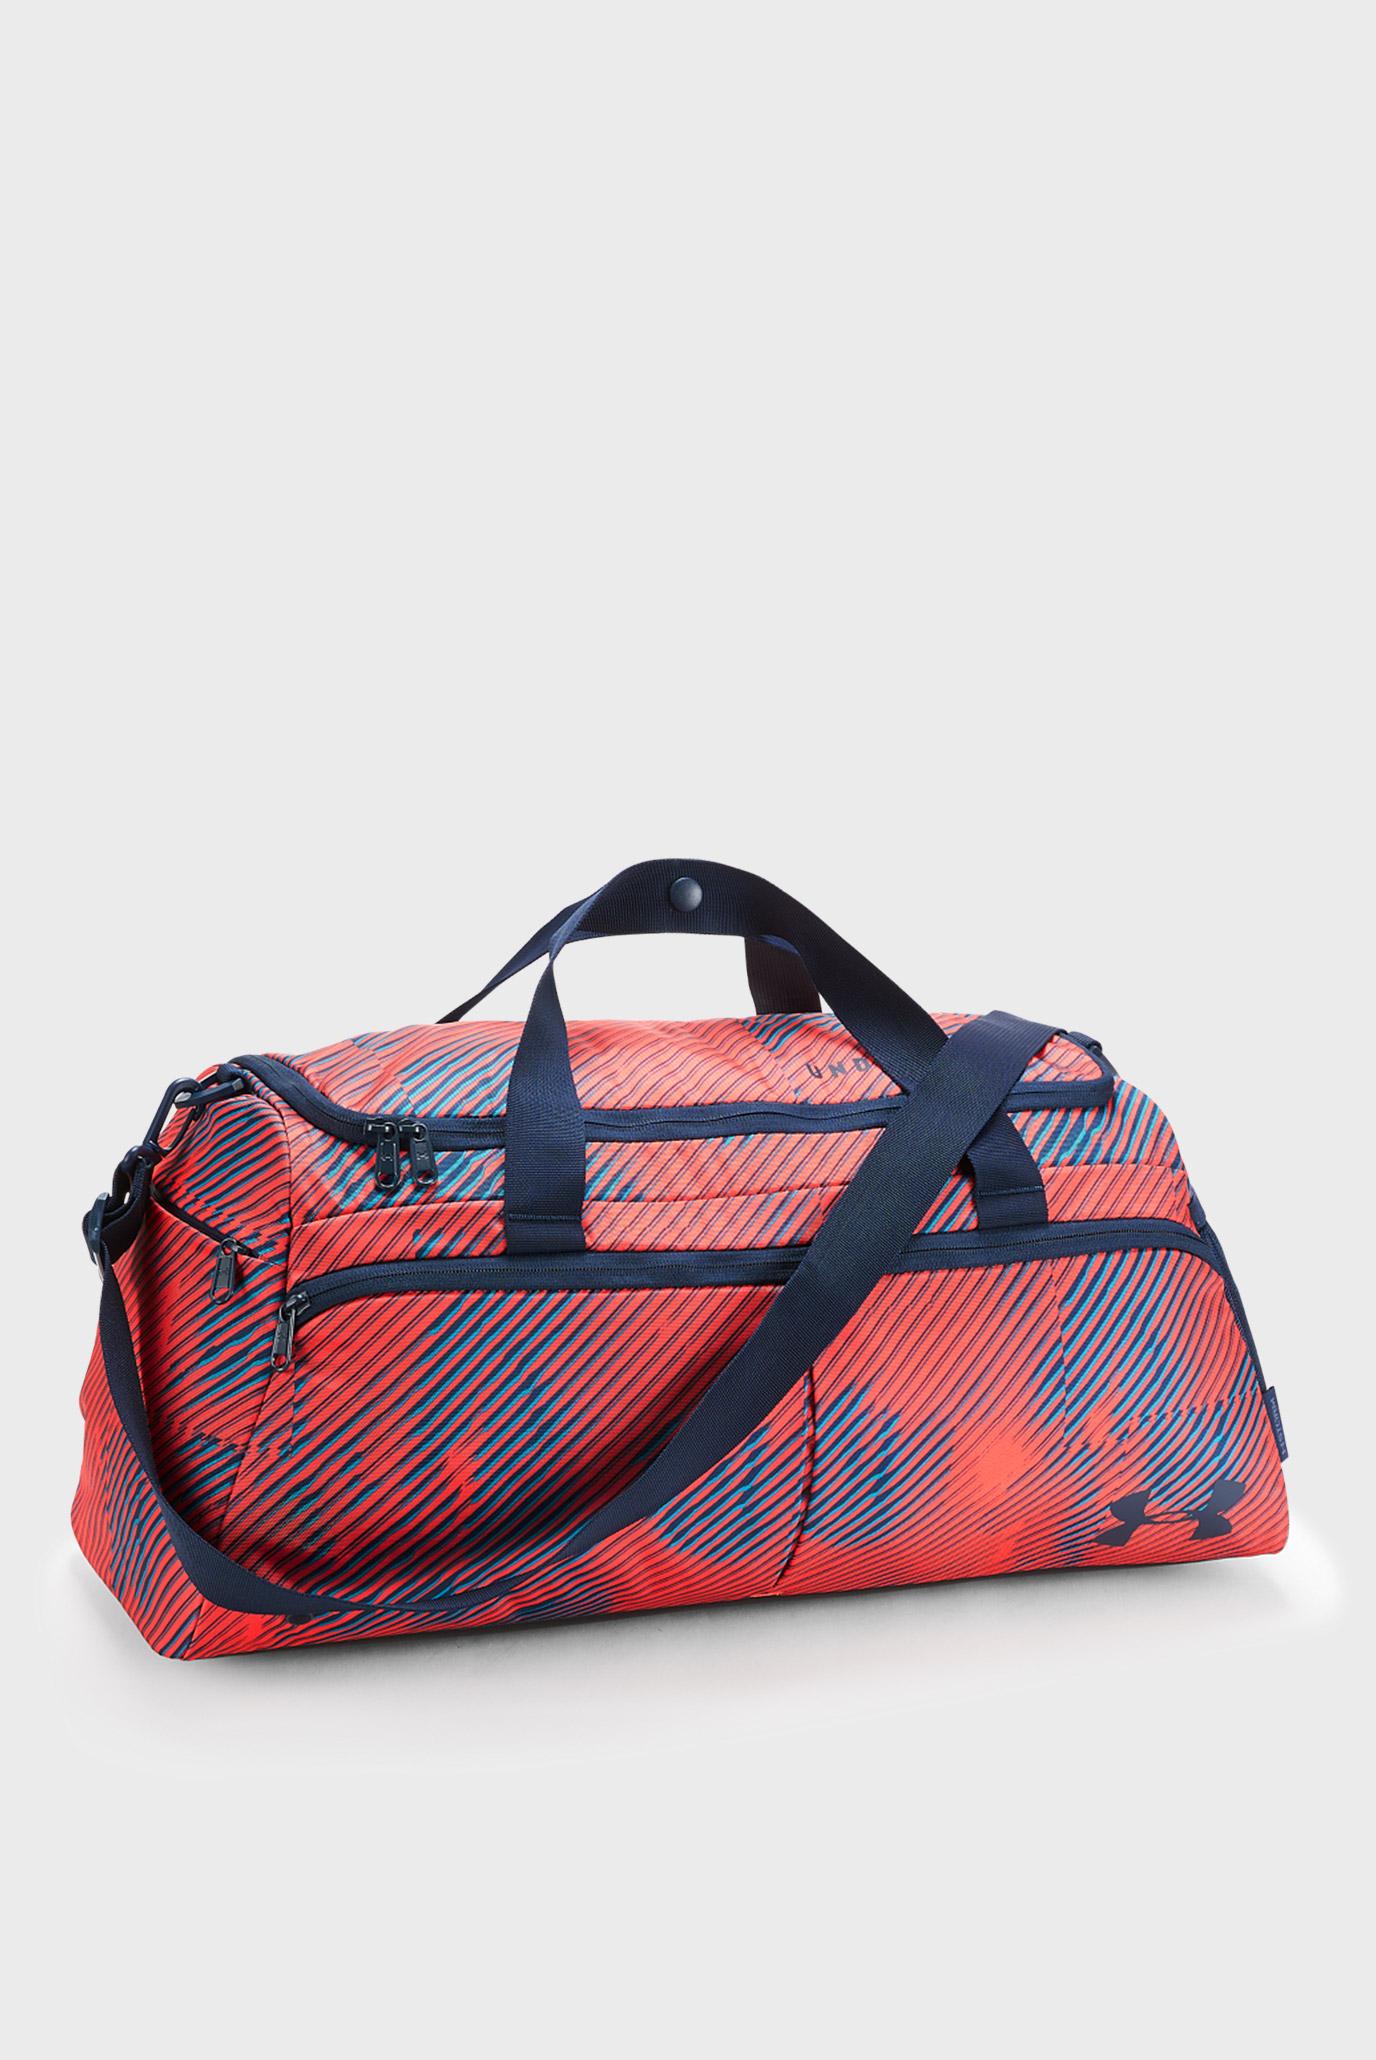 a40c8677 Купить Женская красная спортивная сумка W's Undeniable Duffle-S Under  Armour Under Armour 1306405-877 – Киев, ...